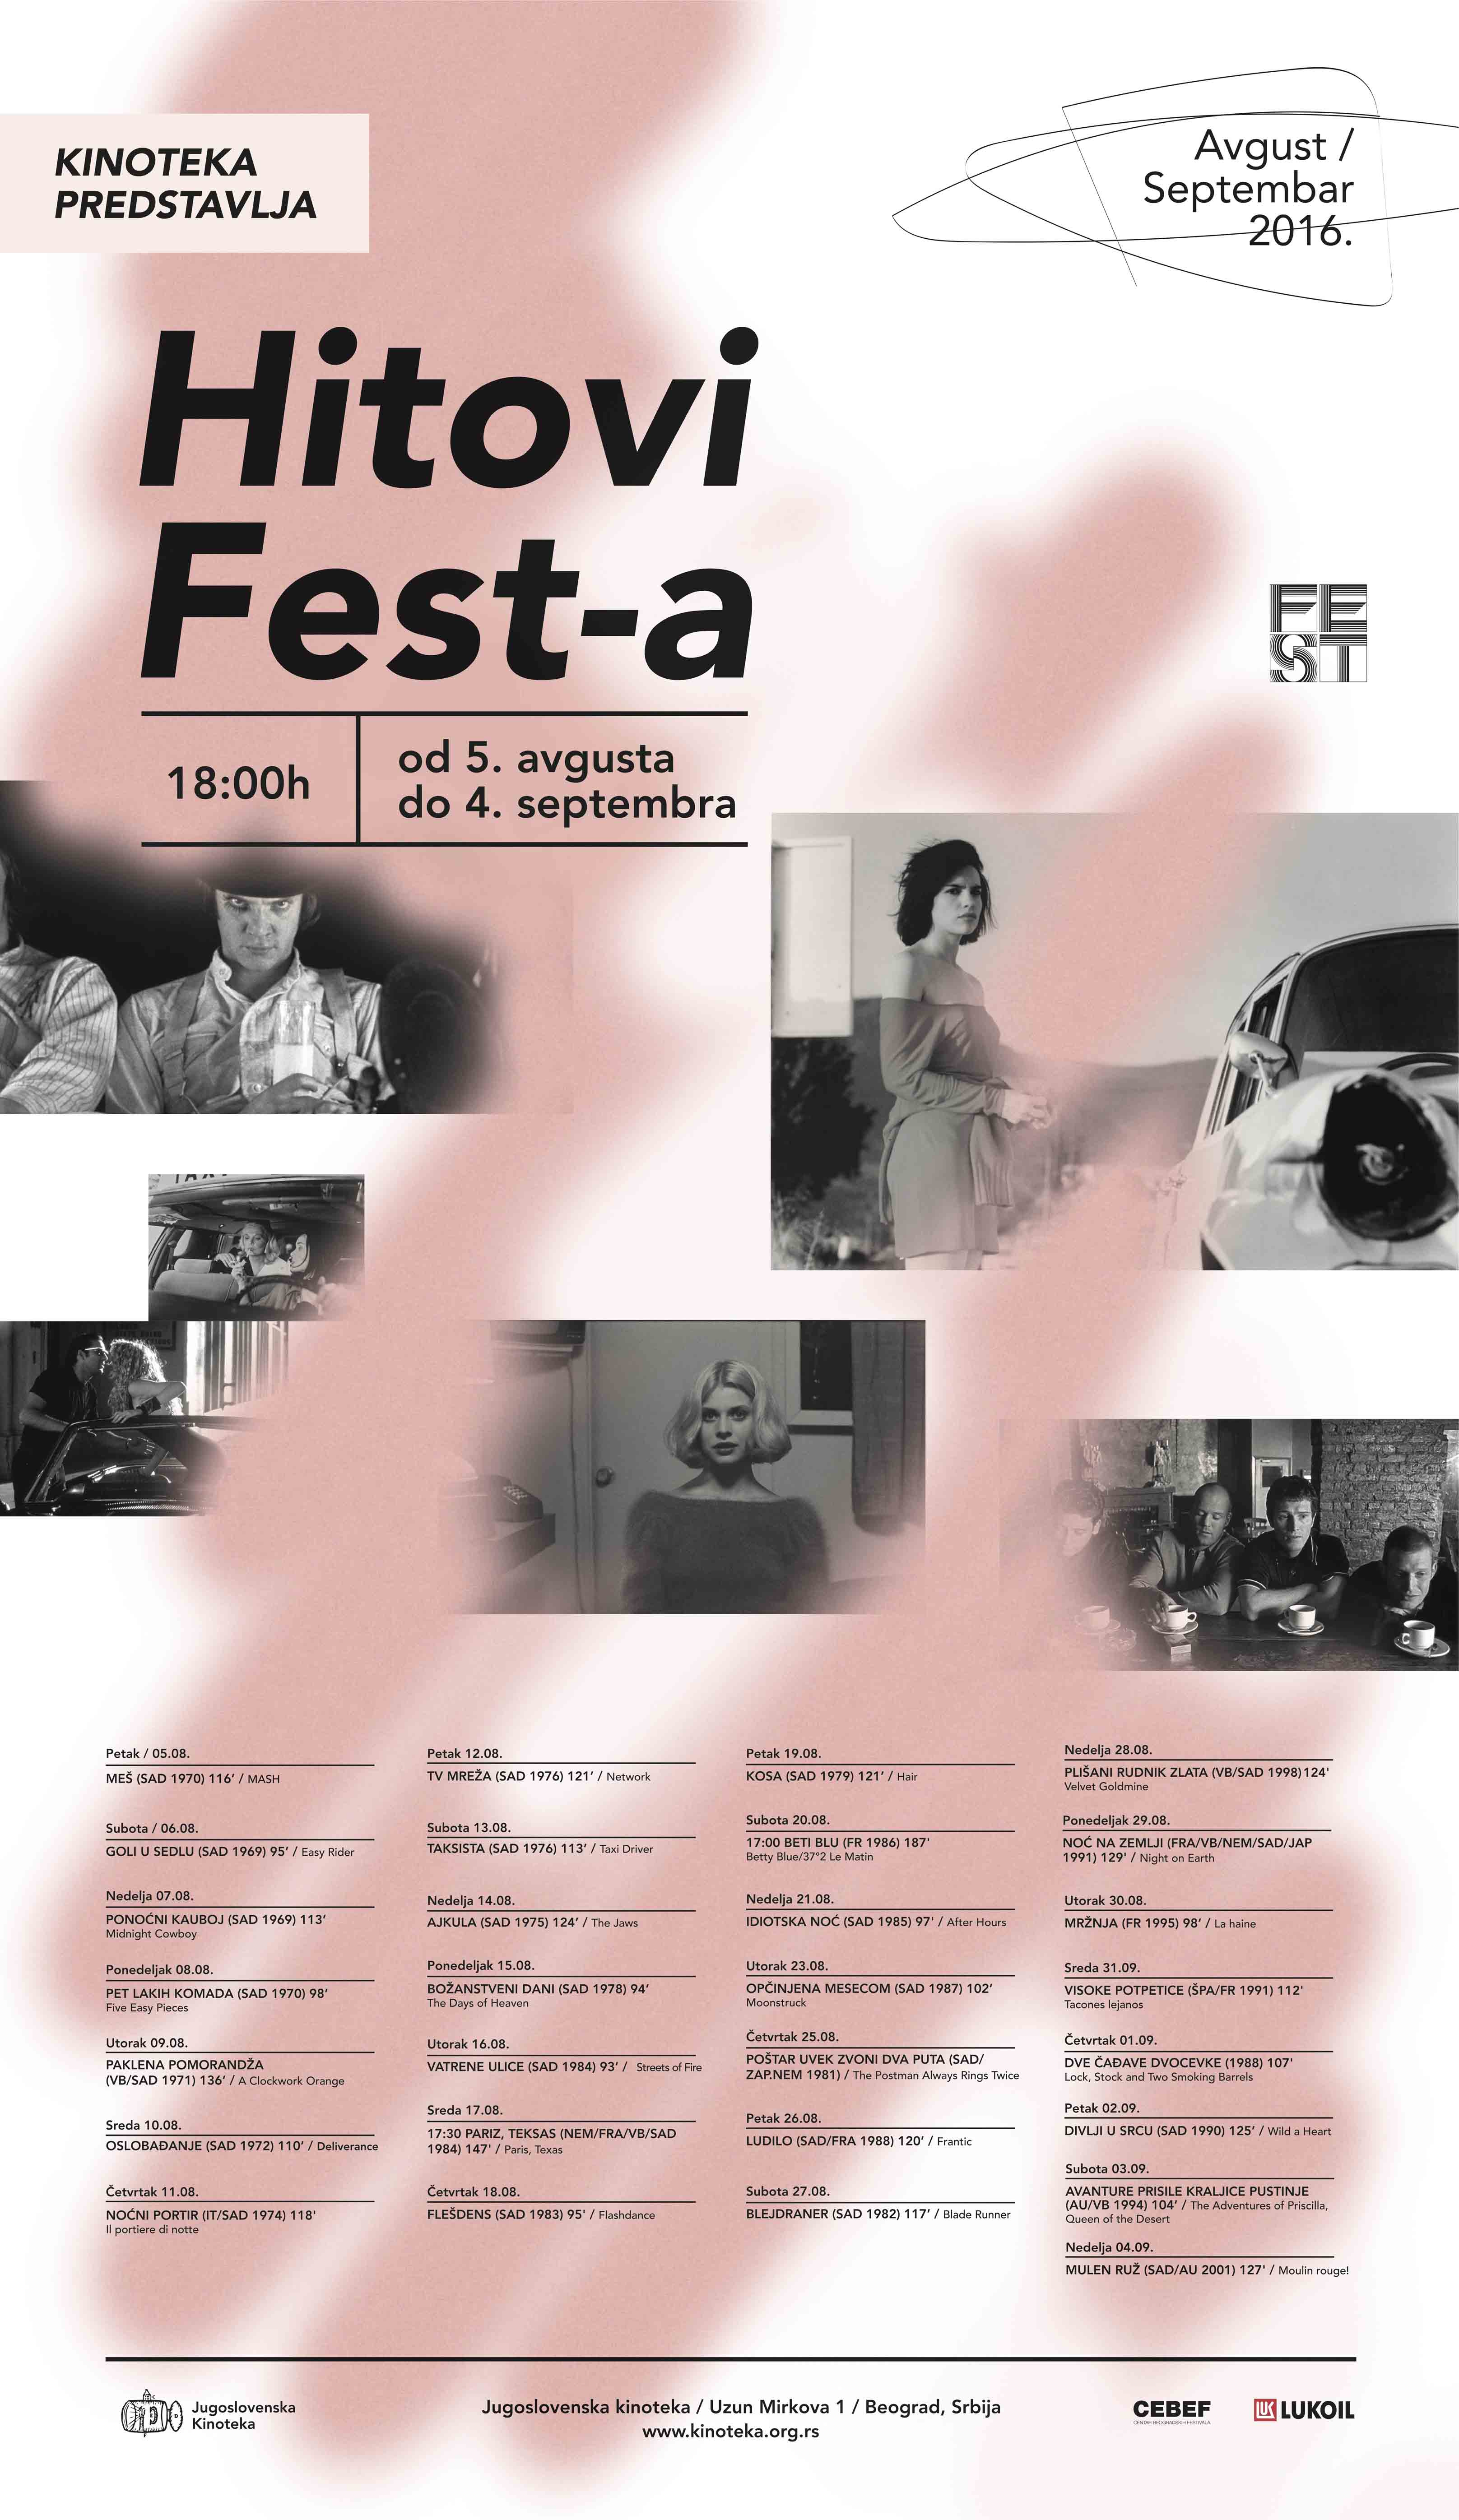 Hitovi FEST-a – Jugoslovenska kinoteka (plakat)